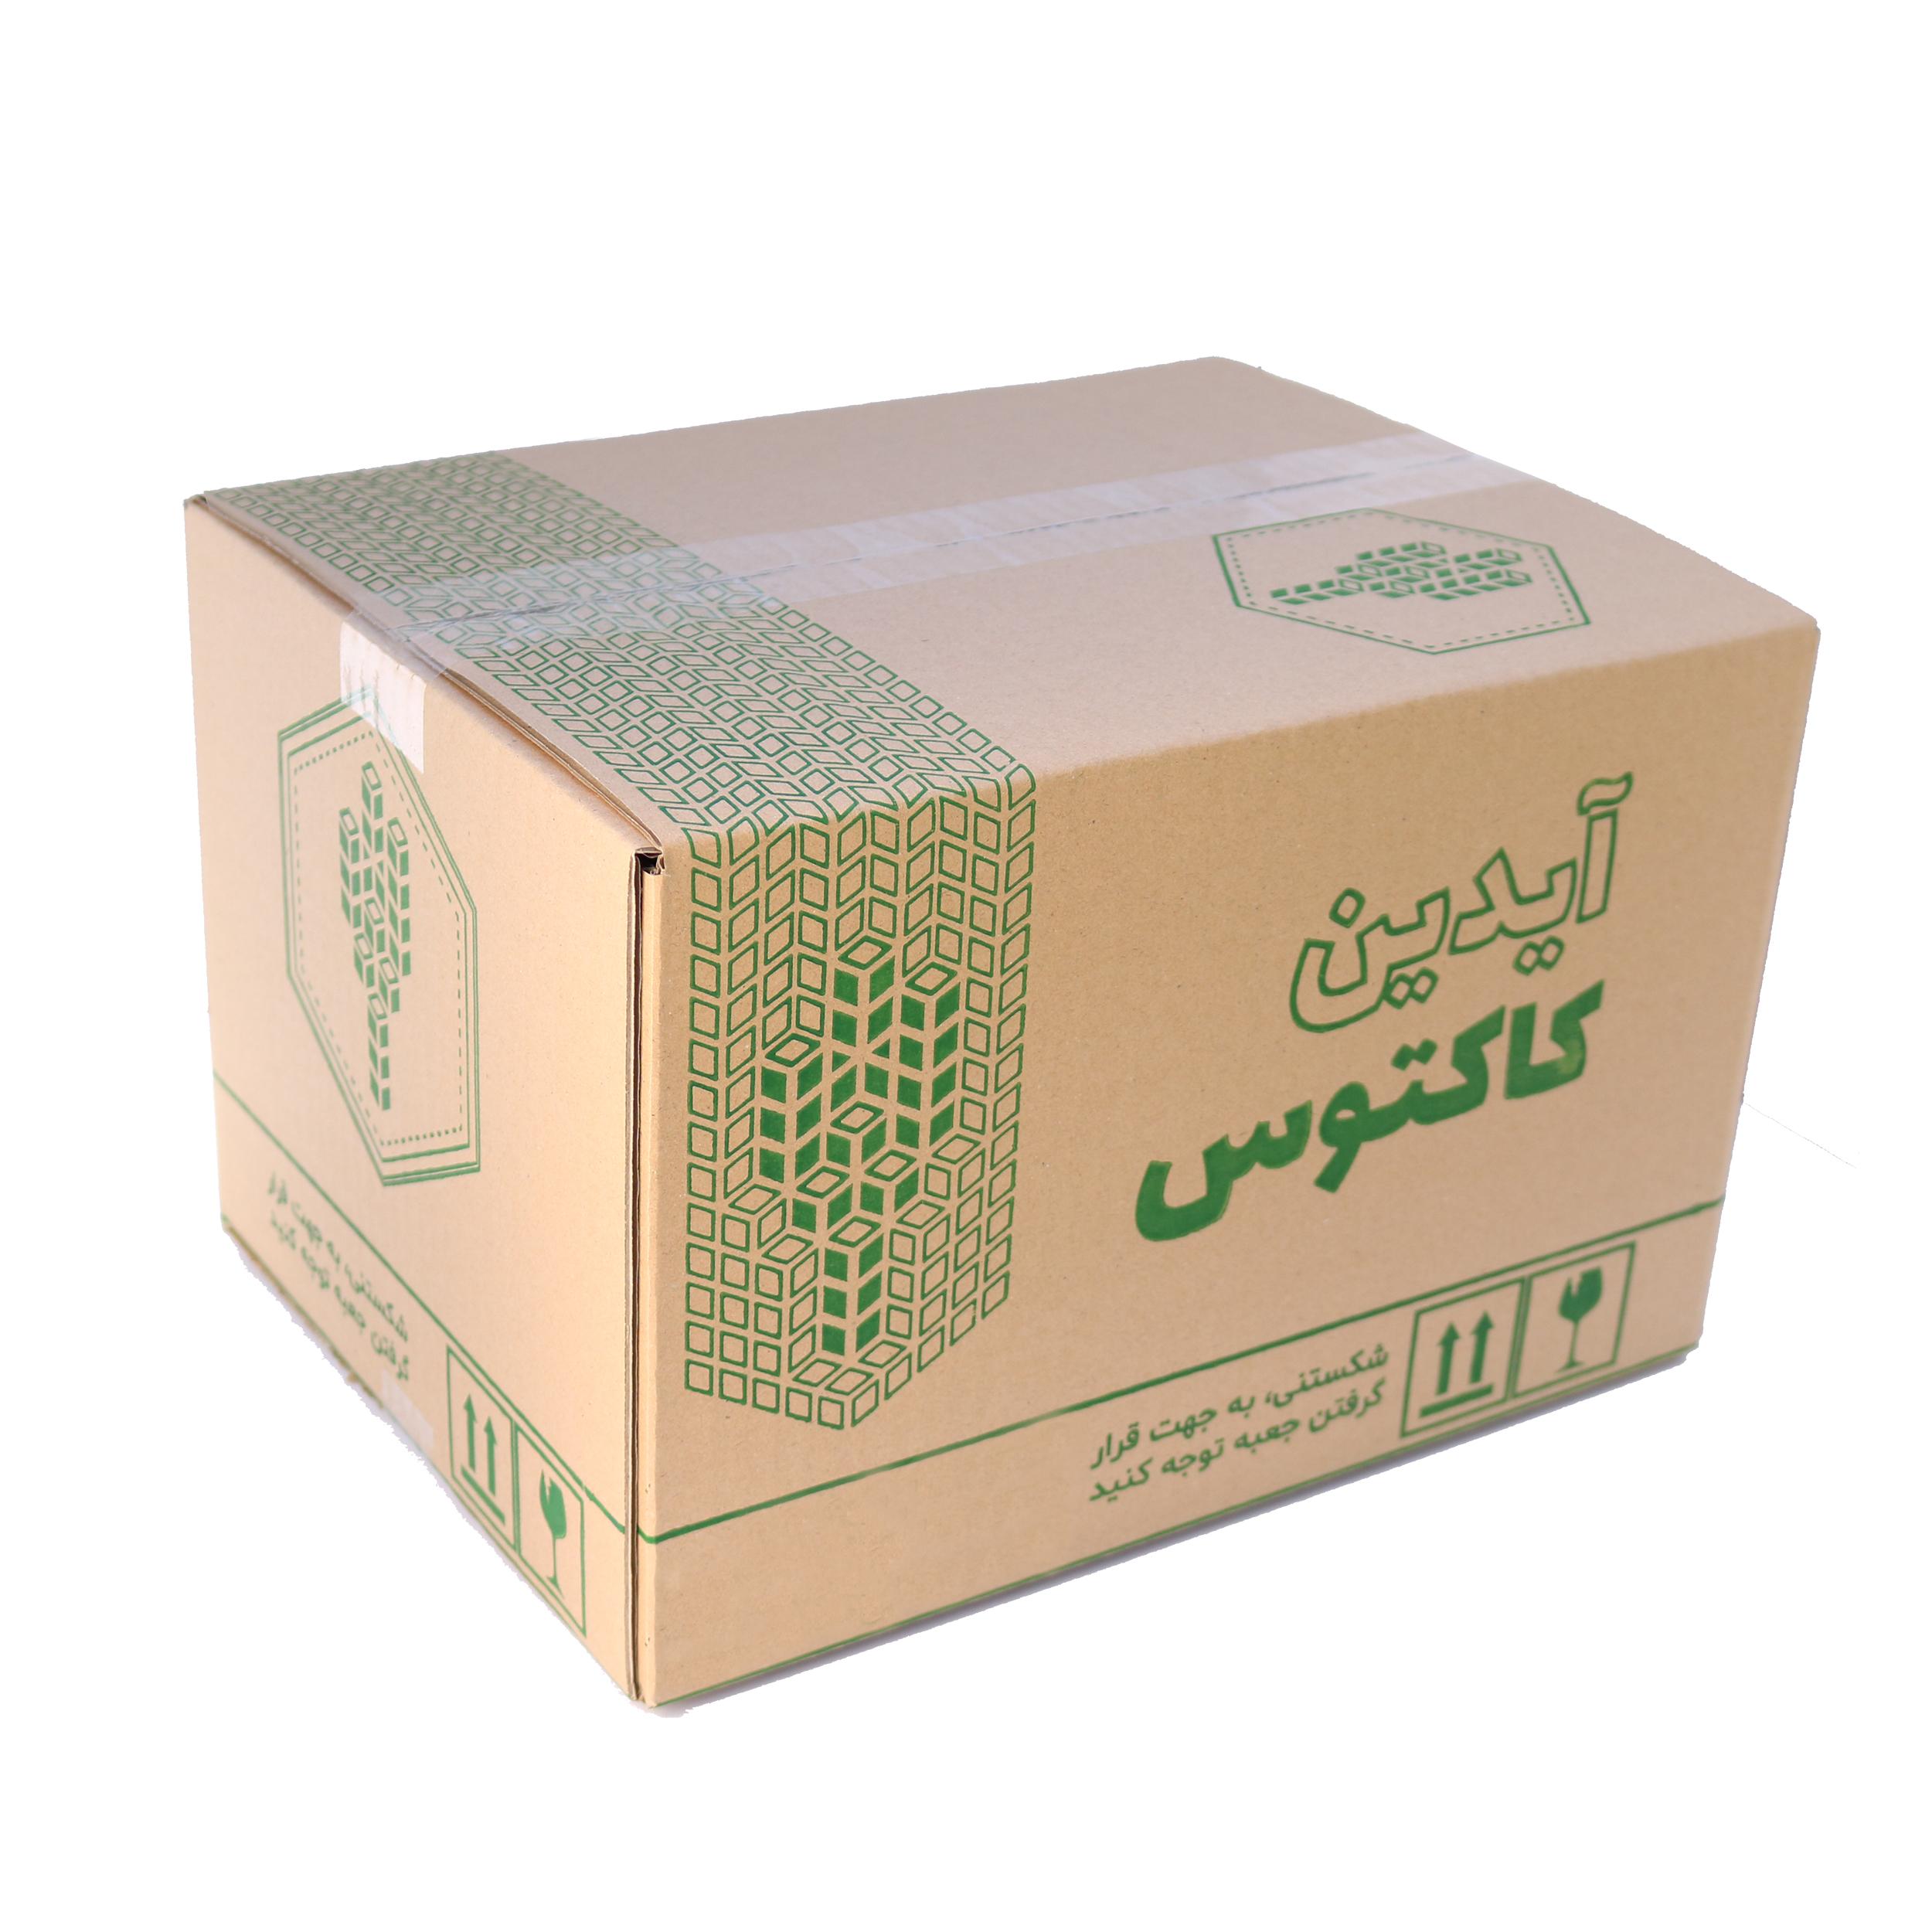 گیاه طبیعی ساکولنت آیدین کاکتوس کد CB-003 بسته 12 عددی main 1 8